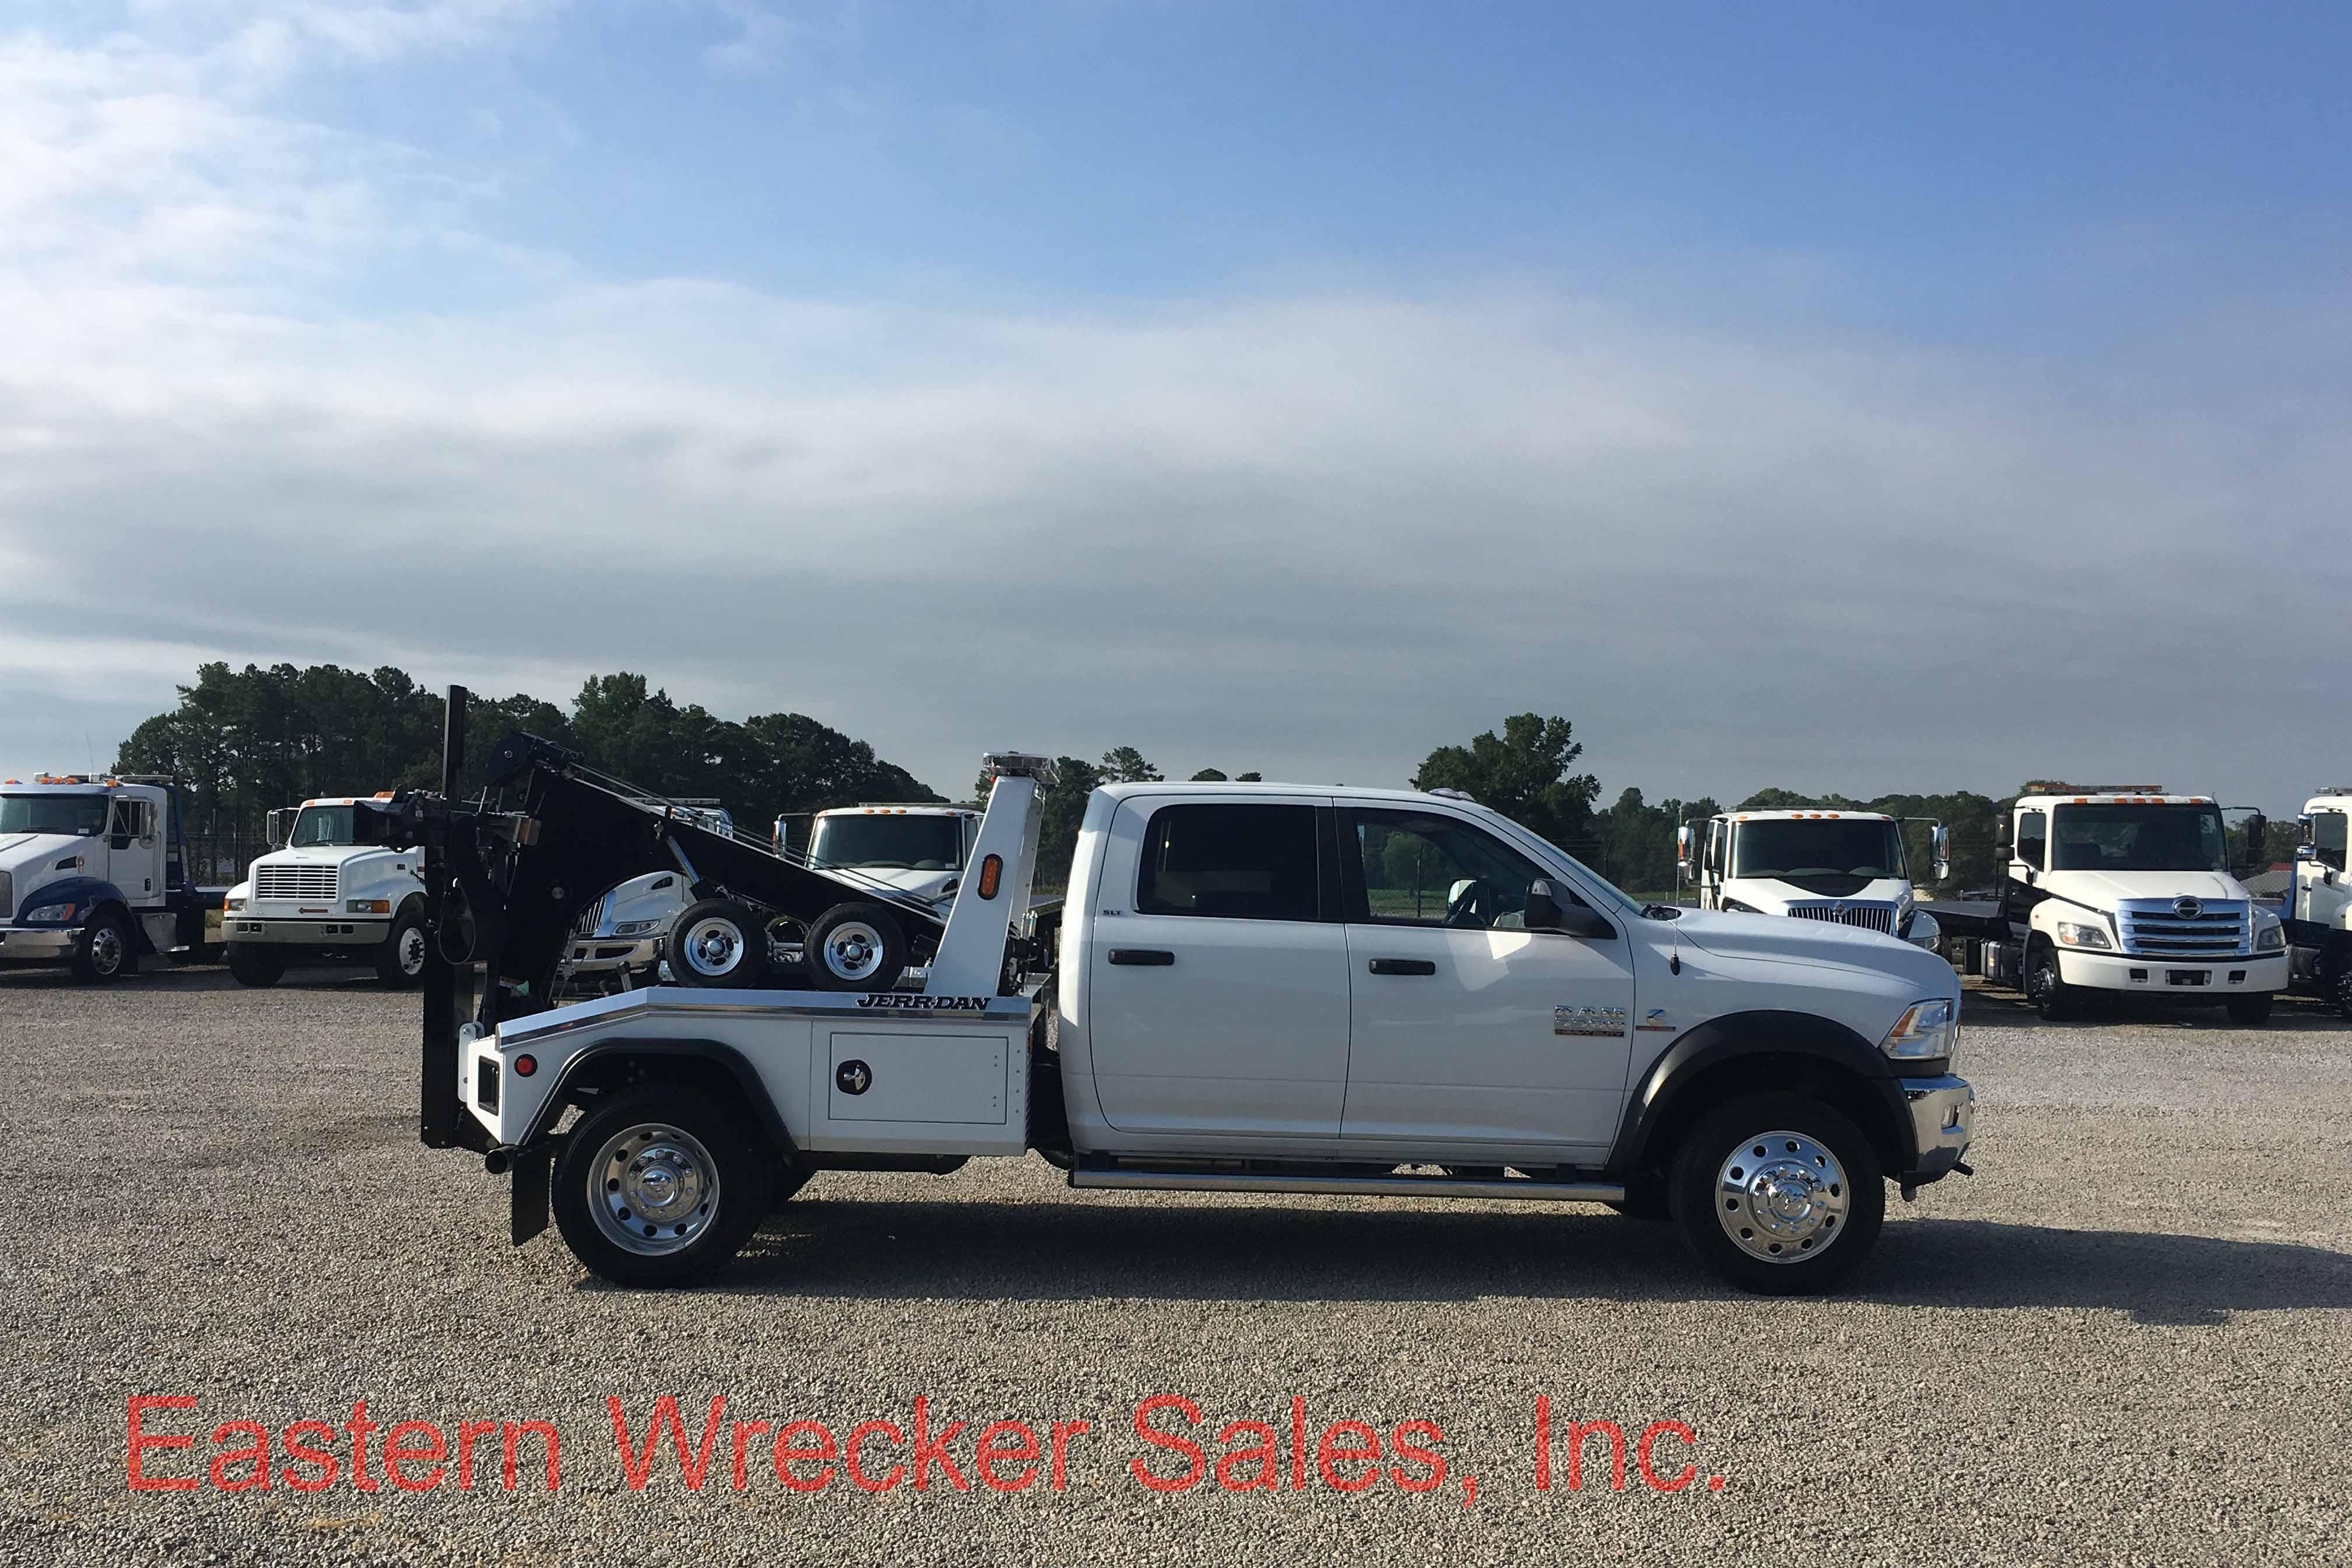 d1974 side ps 2017 dodge quad cab tow truck for sale jerr dan wrecker mpl towing twin line. Black Bedroom Furniture Sets. Home Design Ideas